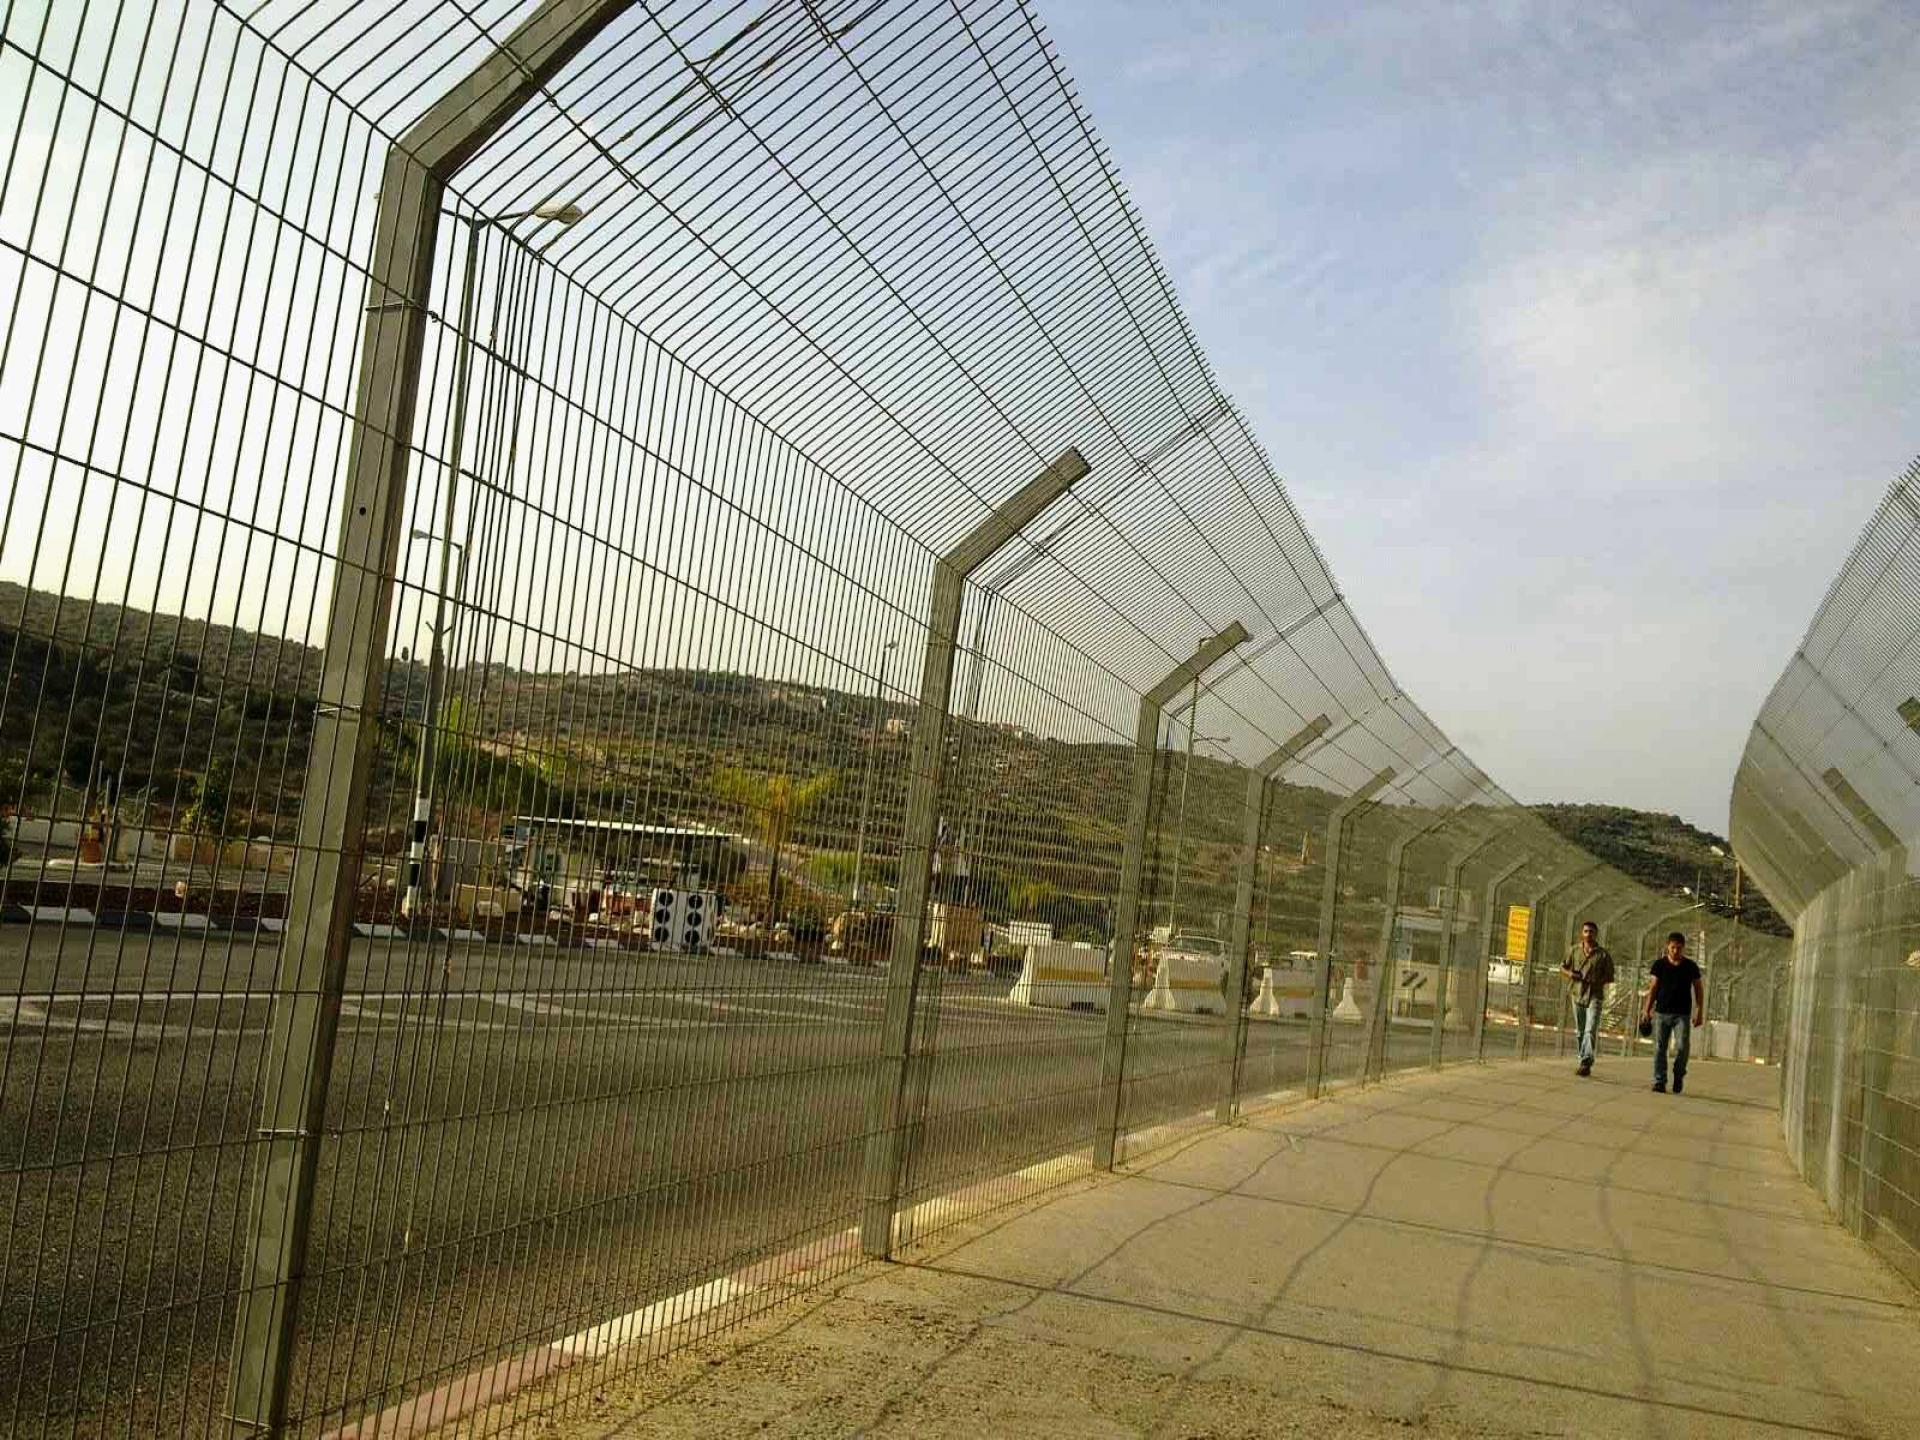 Barta'a/Reikhan checkpoint 21.10.10